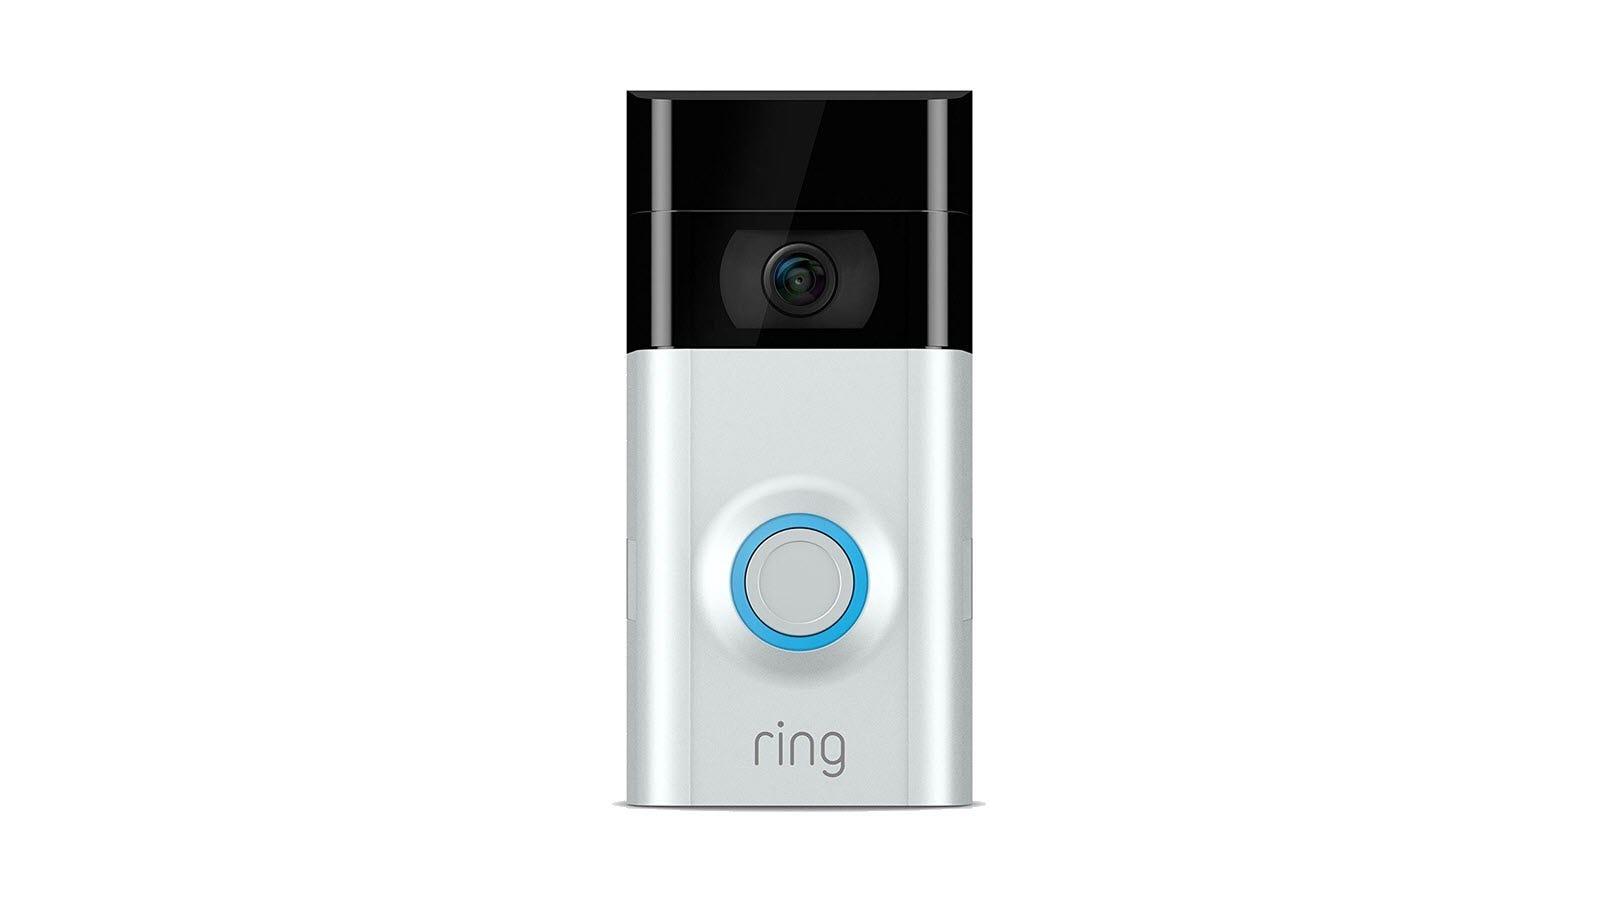 A Ring 2 Video doorbell